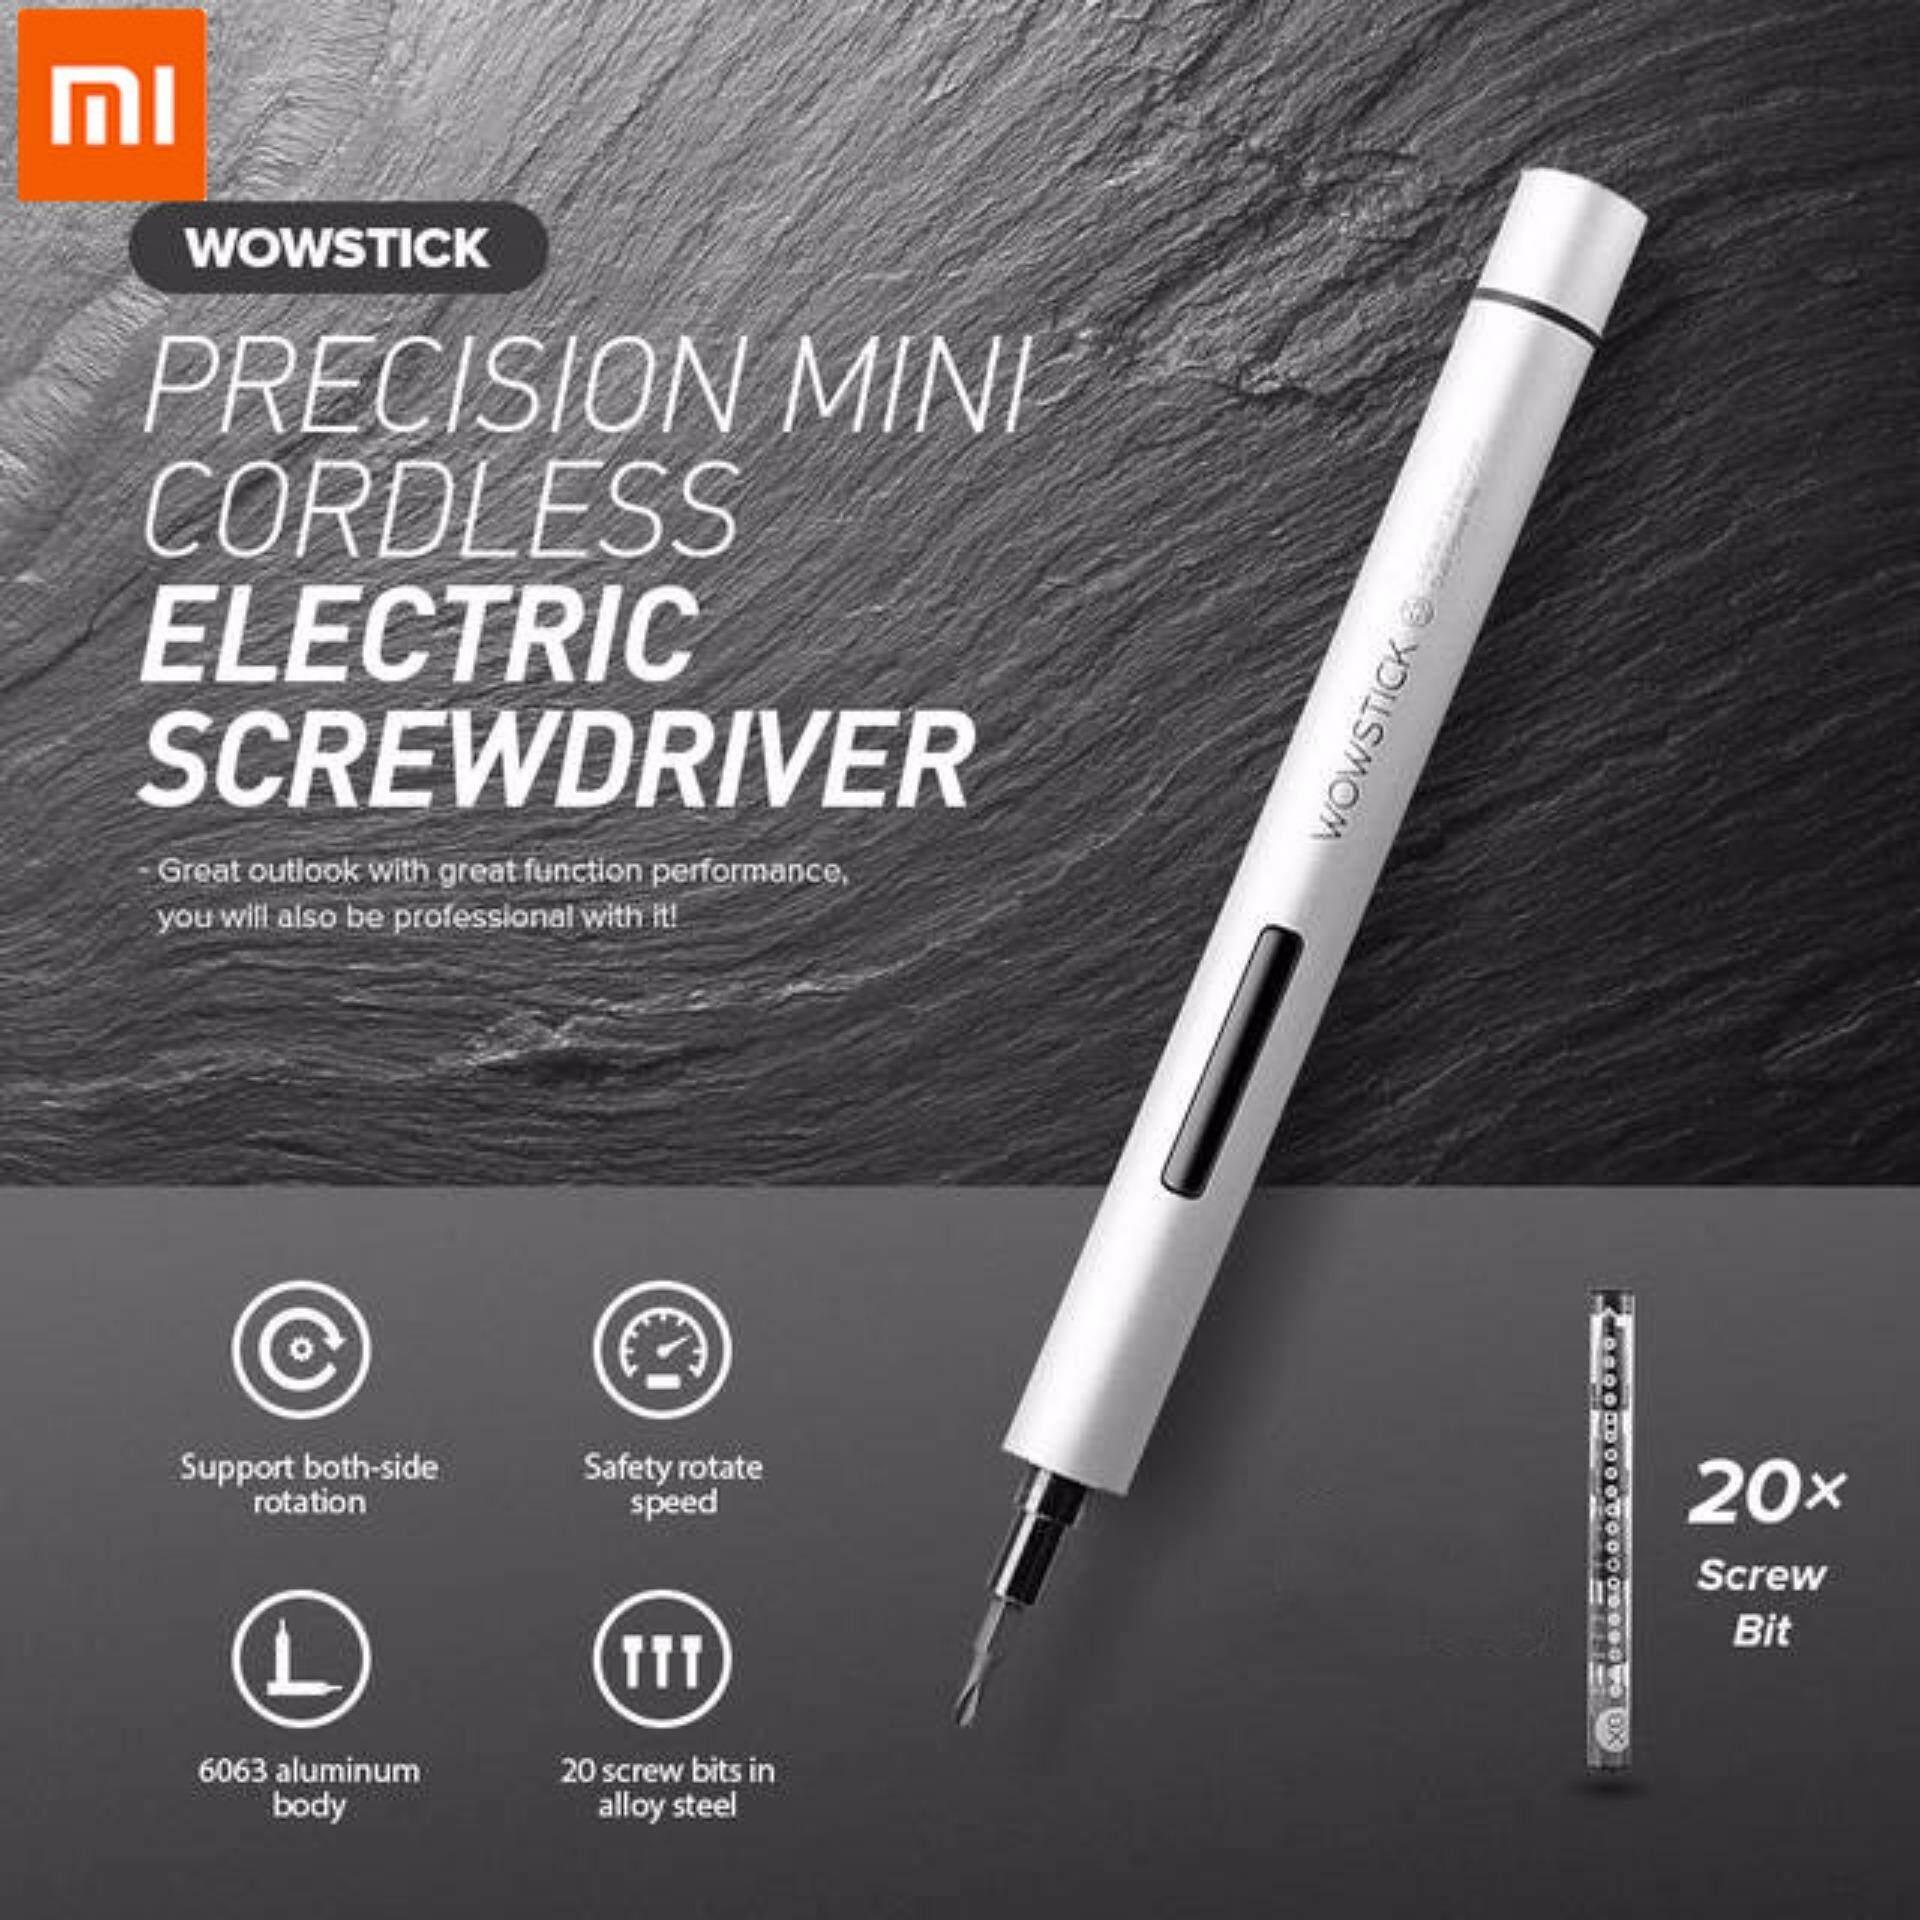 Xiaomi Wowstick 21 in 1 Precision Mini Handheld Cordless Electric Screwdriver